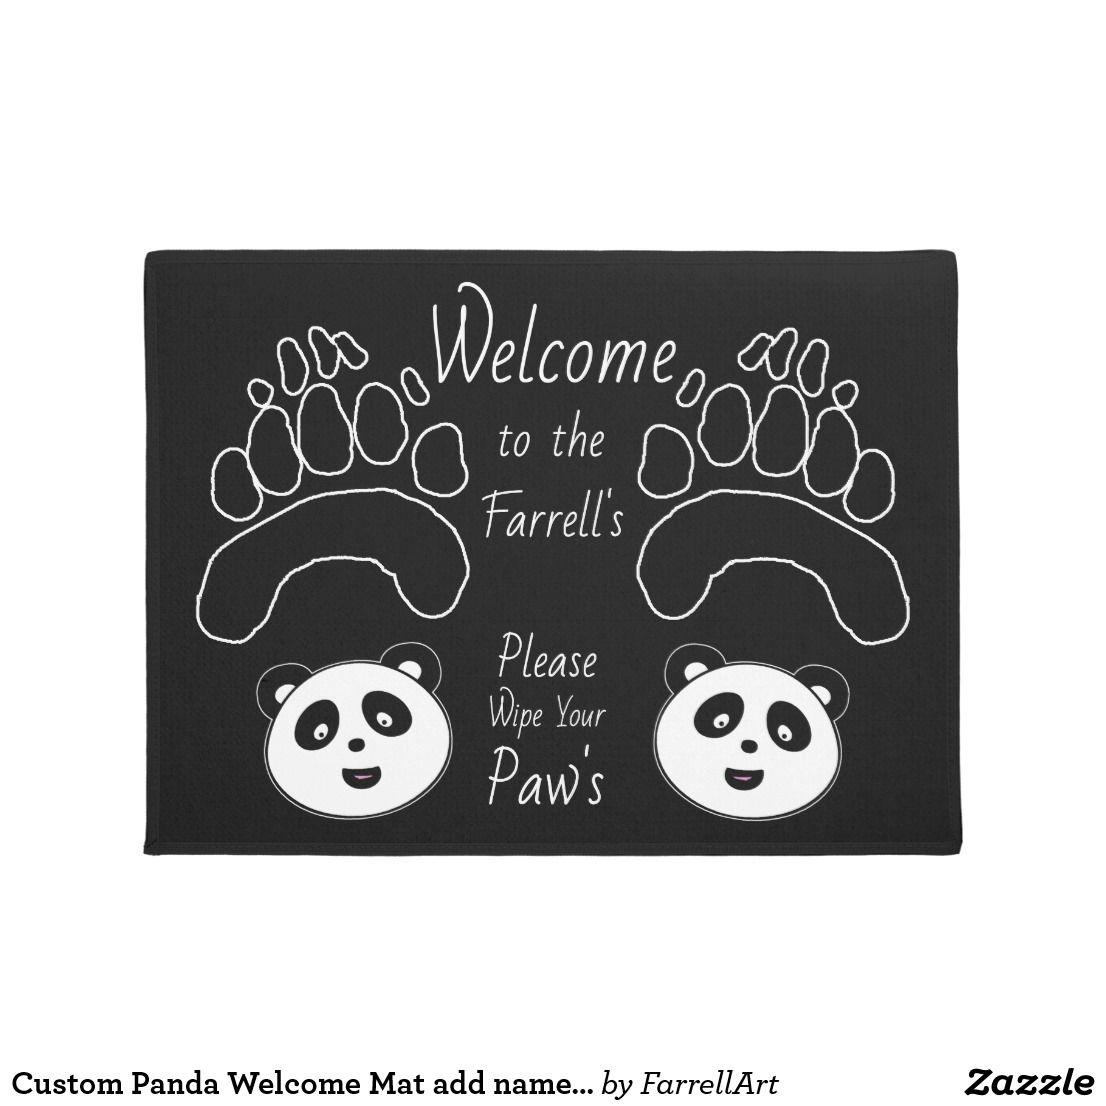 Custom Panda Mat add name wipe paws